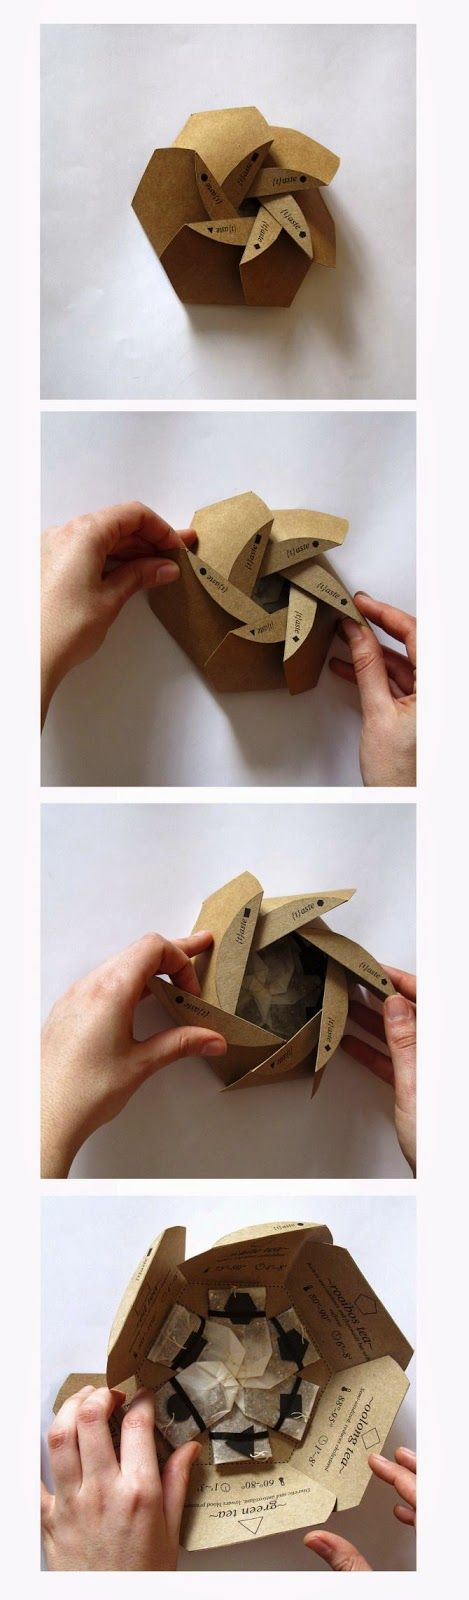 I want pretty: I want pretty: #Diseño- #Empaques #creativos/ Creative #packaging!